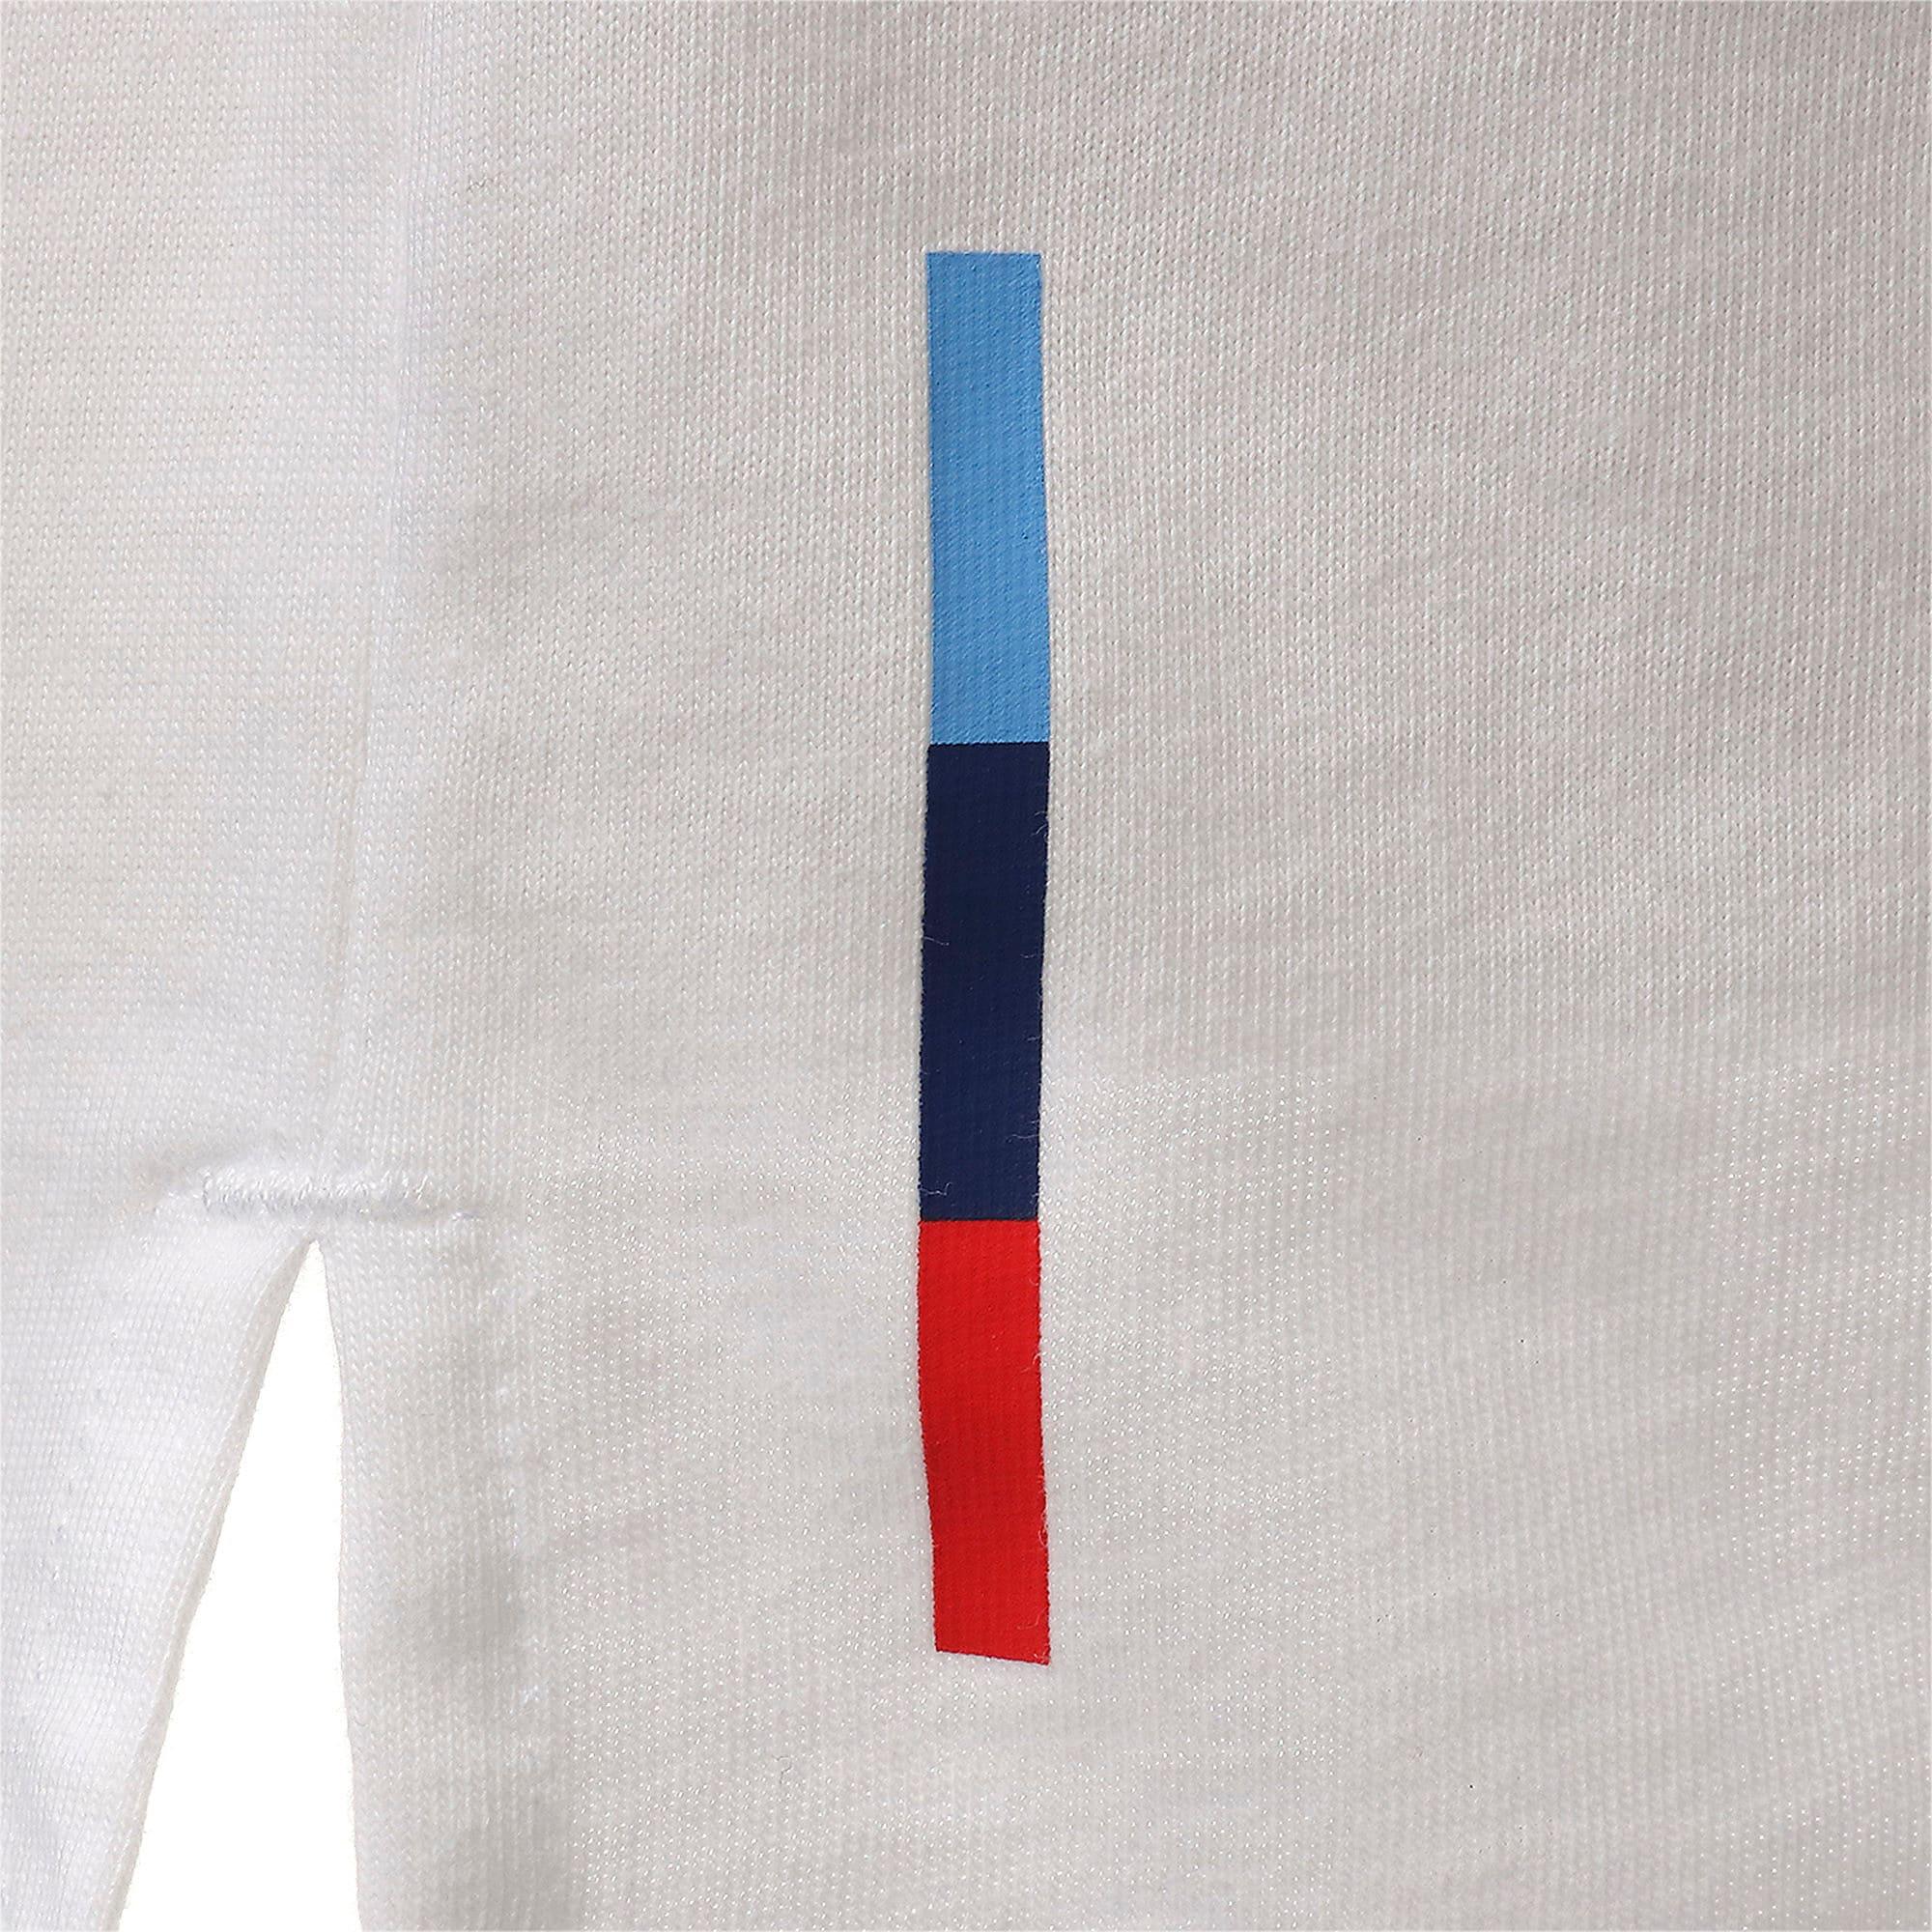 Thumbnail 9 of BMW MMS ライフ Tシャツ, Puma White, medium-JPN